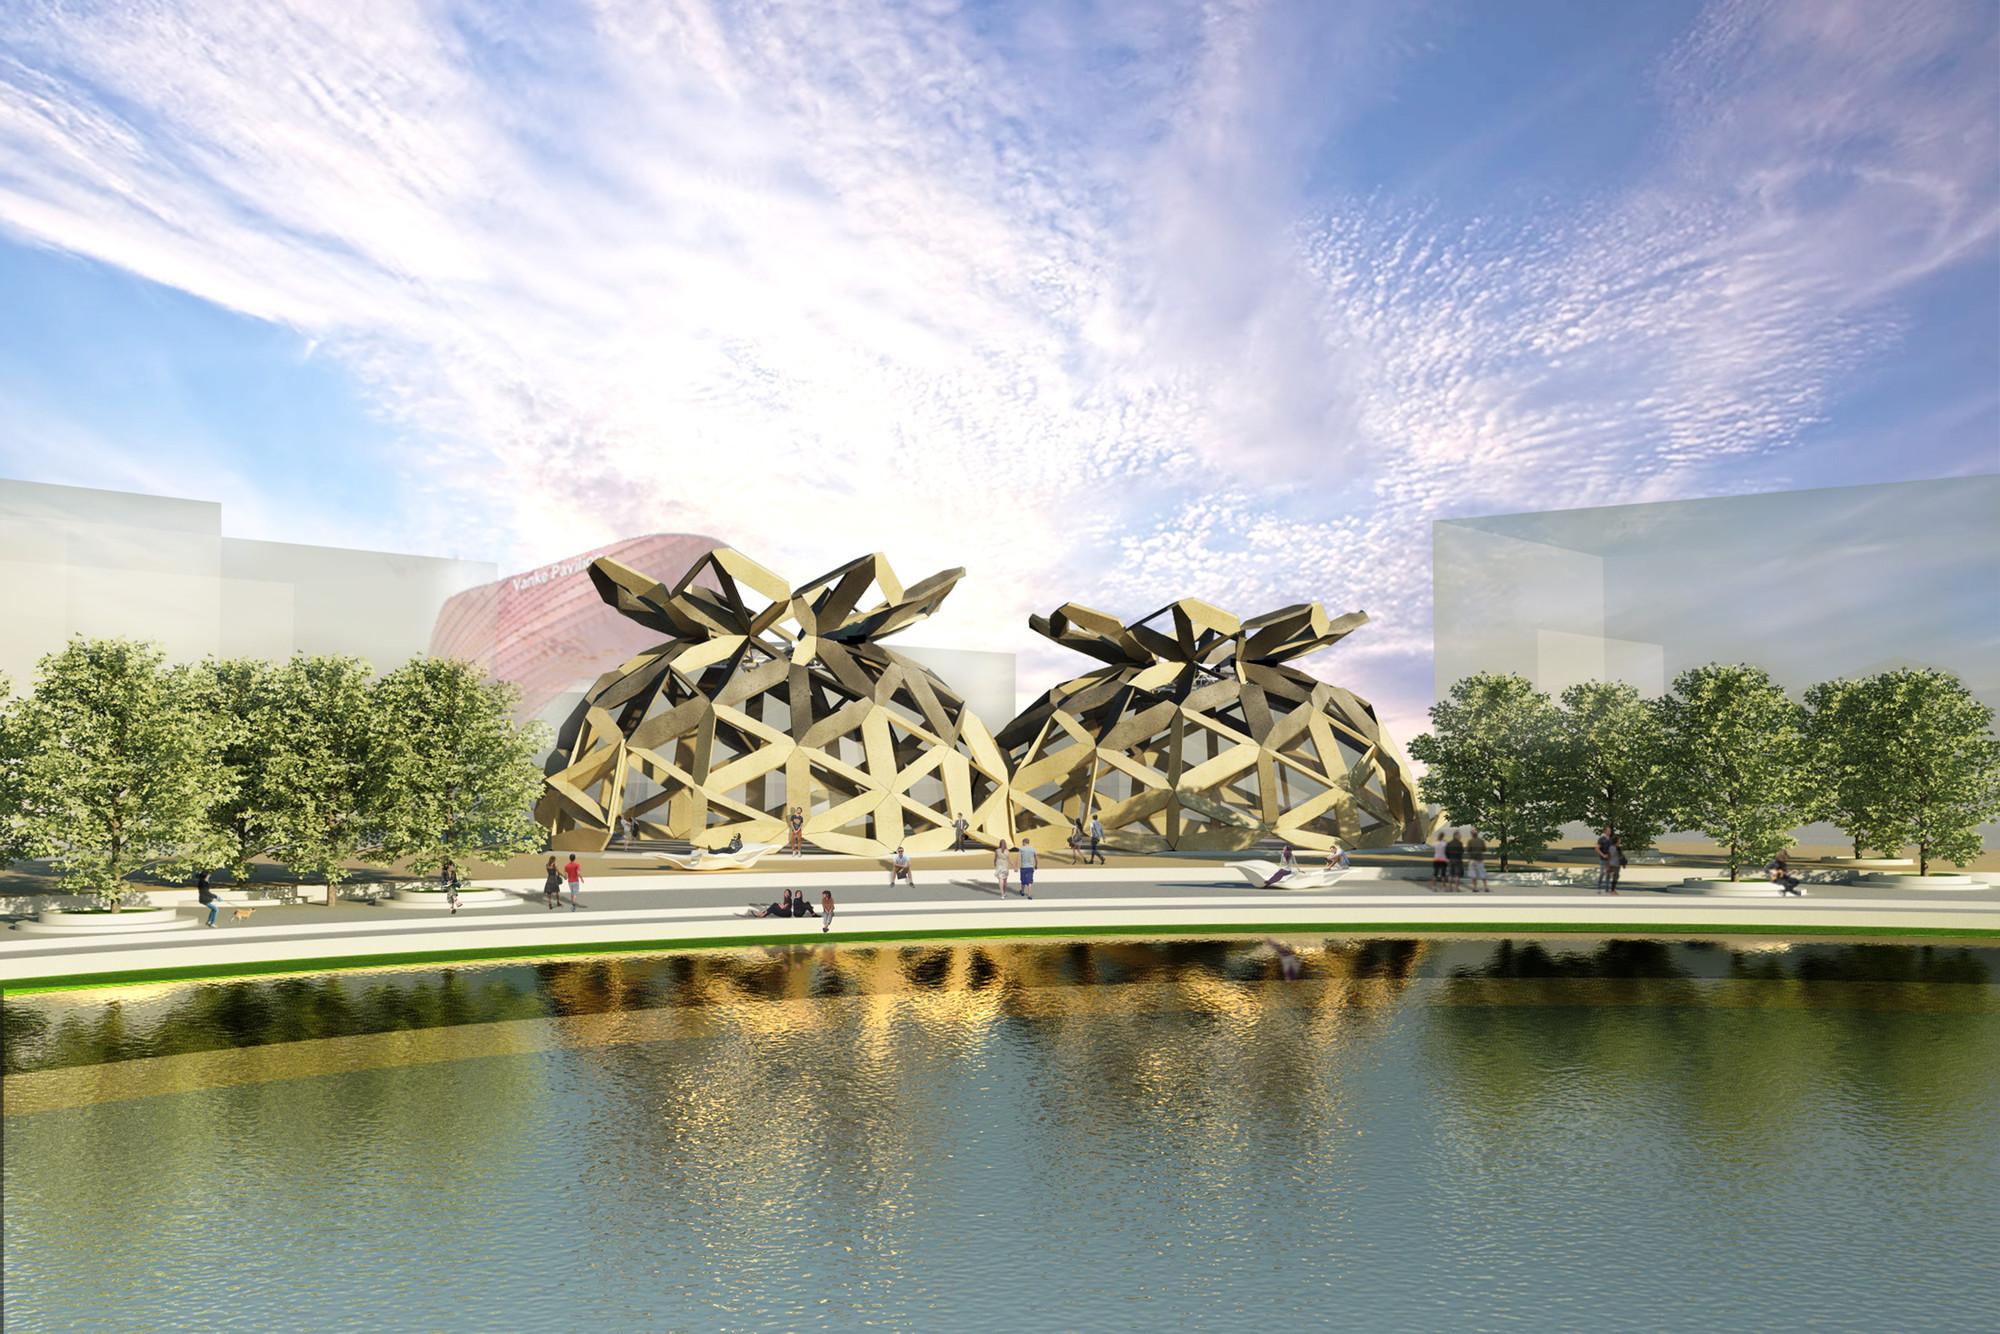 Milan Expo 2015: EMBT Designs Dome for COPAGRI, © Miralles Tagliabue EMBT